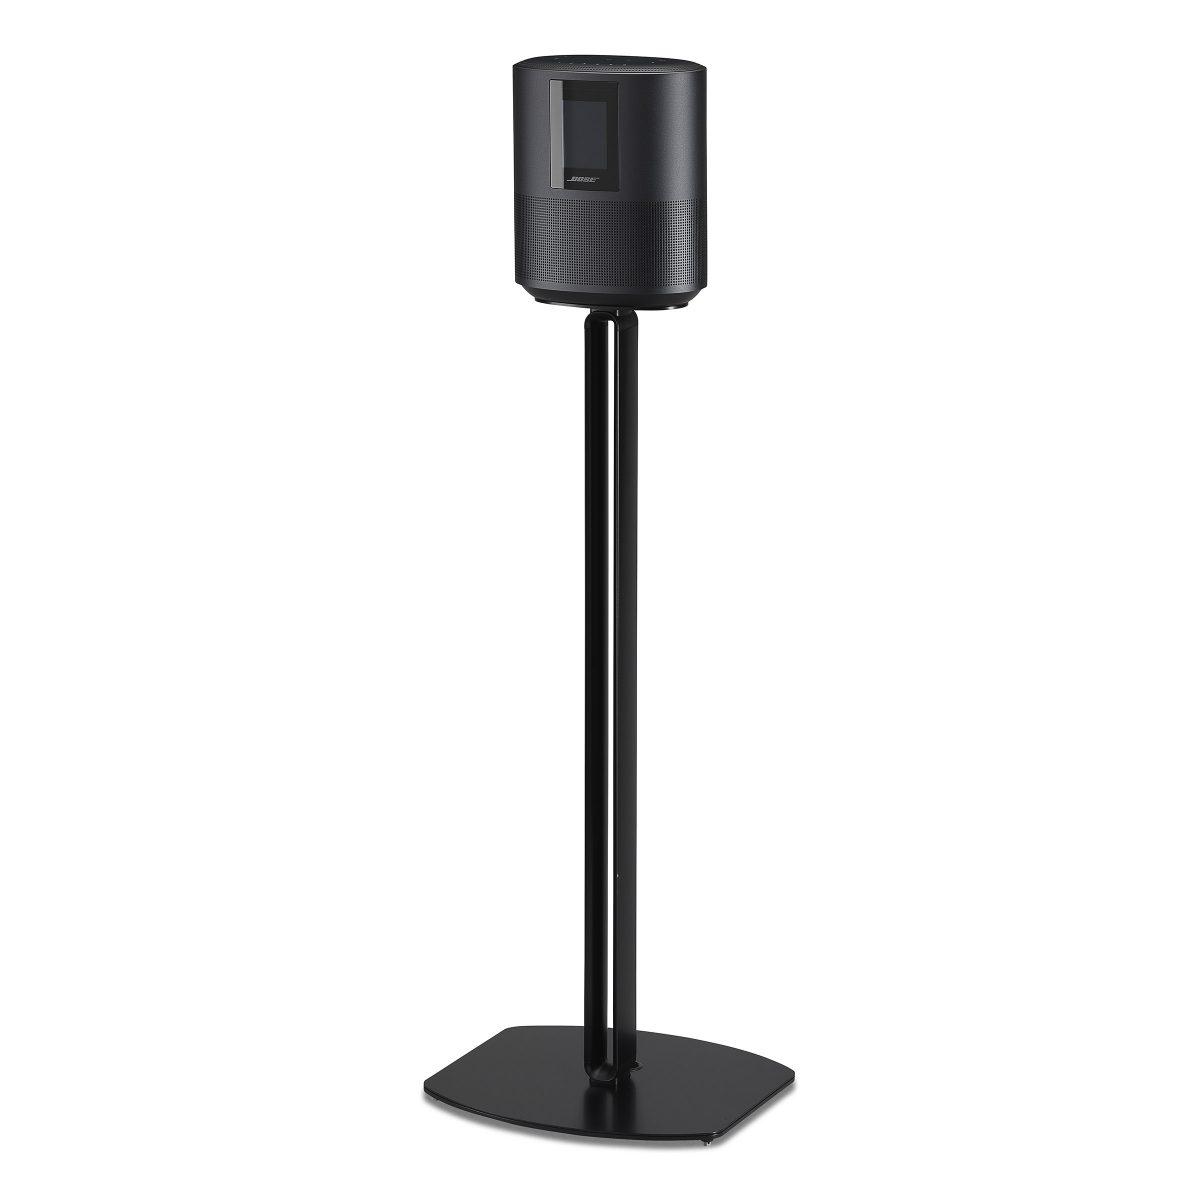 Bose Home Speaker 500 standaard zwart 7